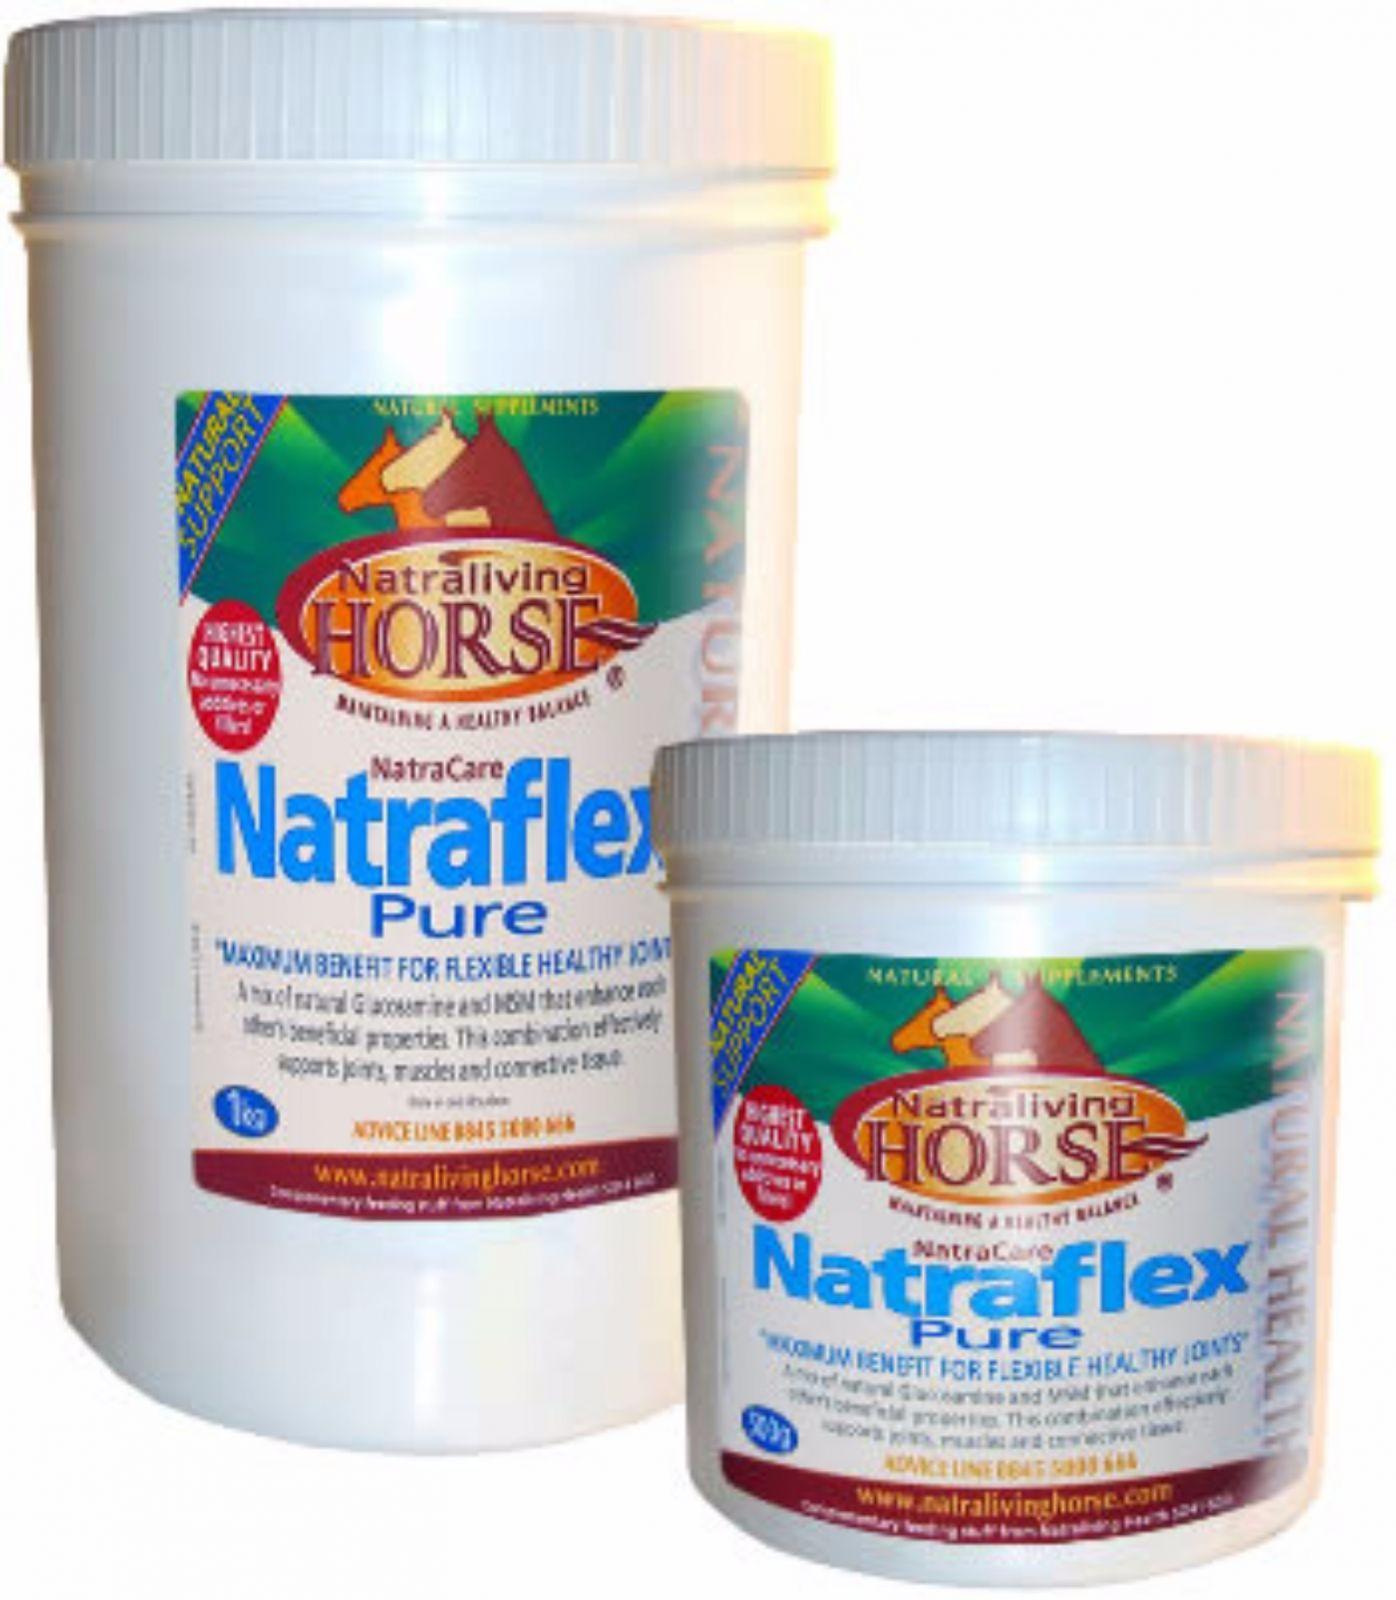 Natraliving Health Natraflex 1 Kg